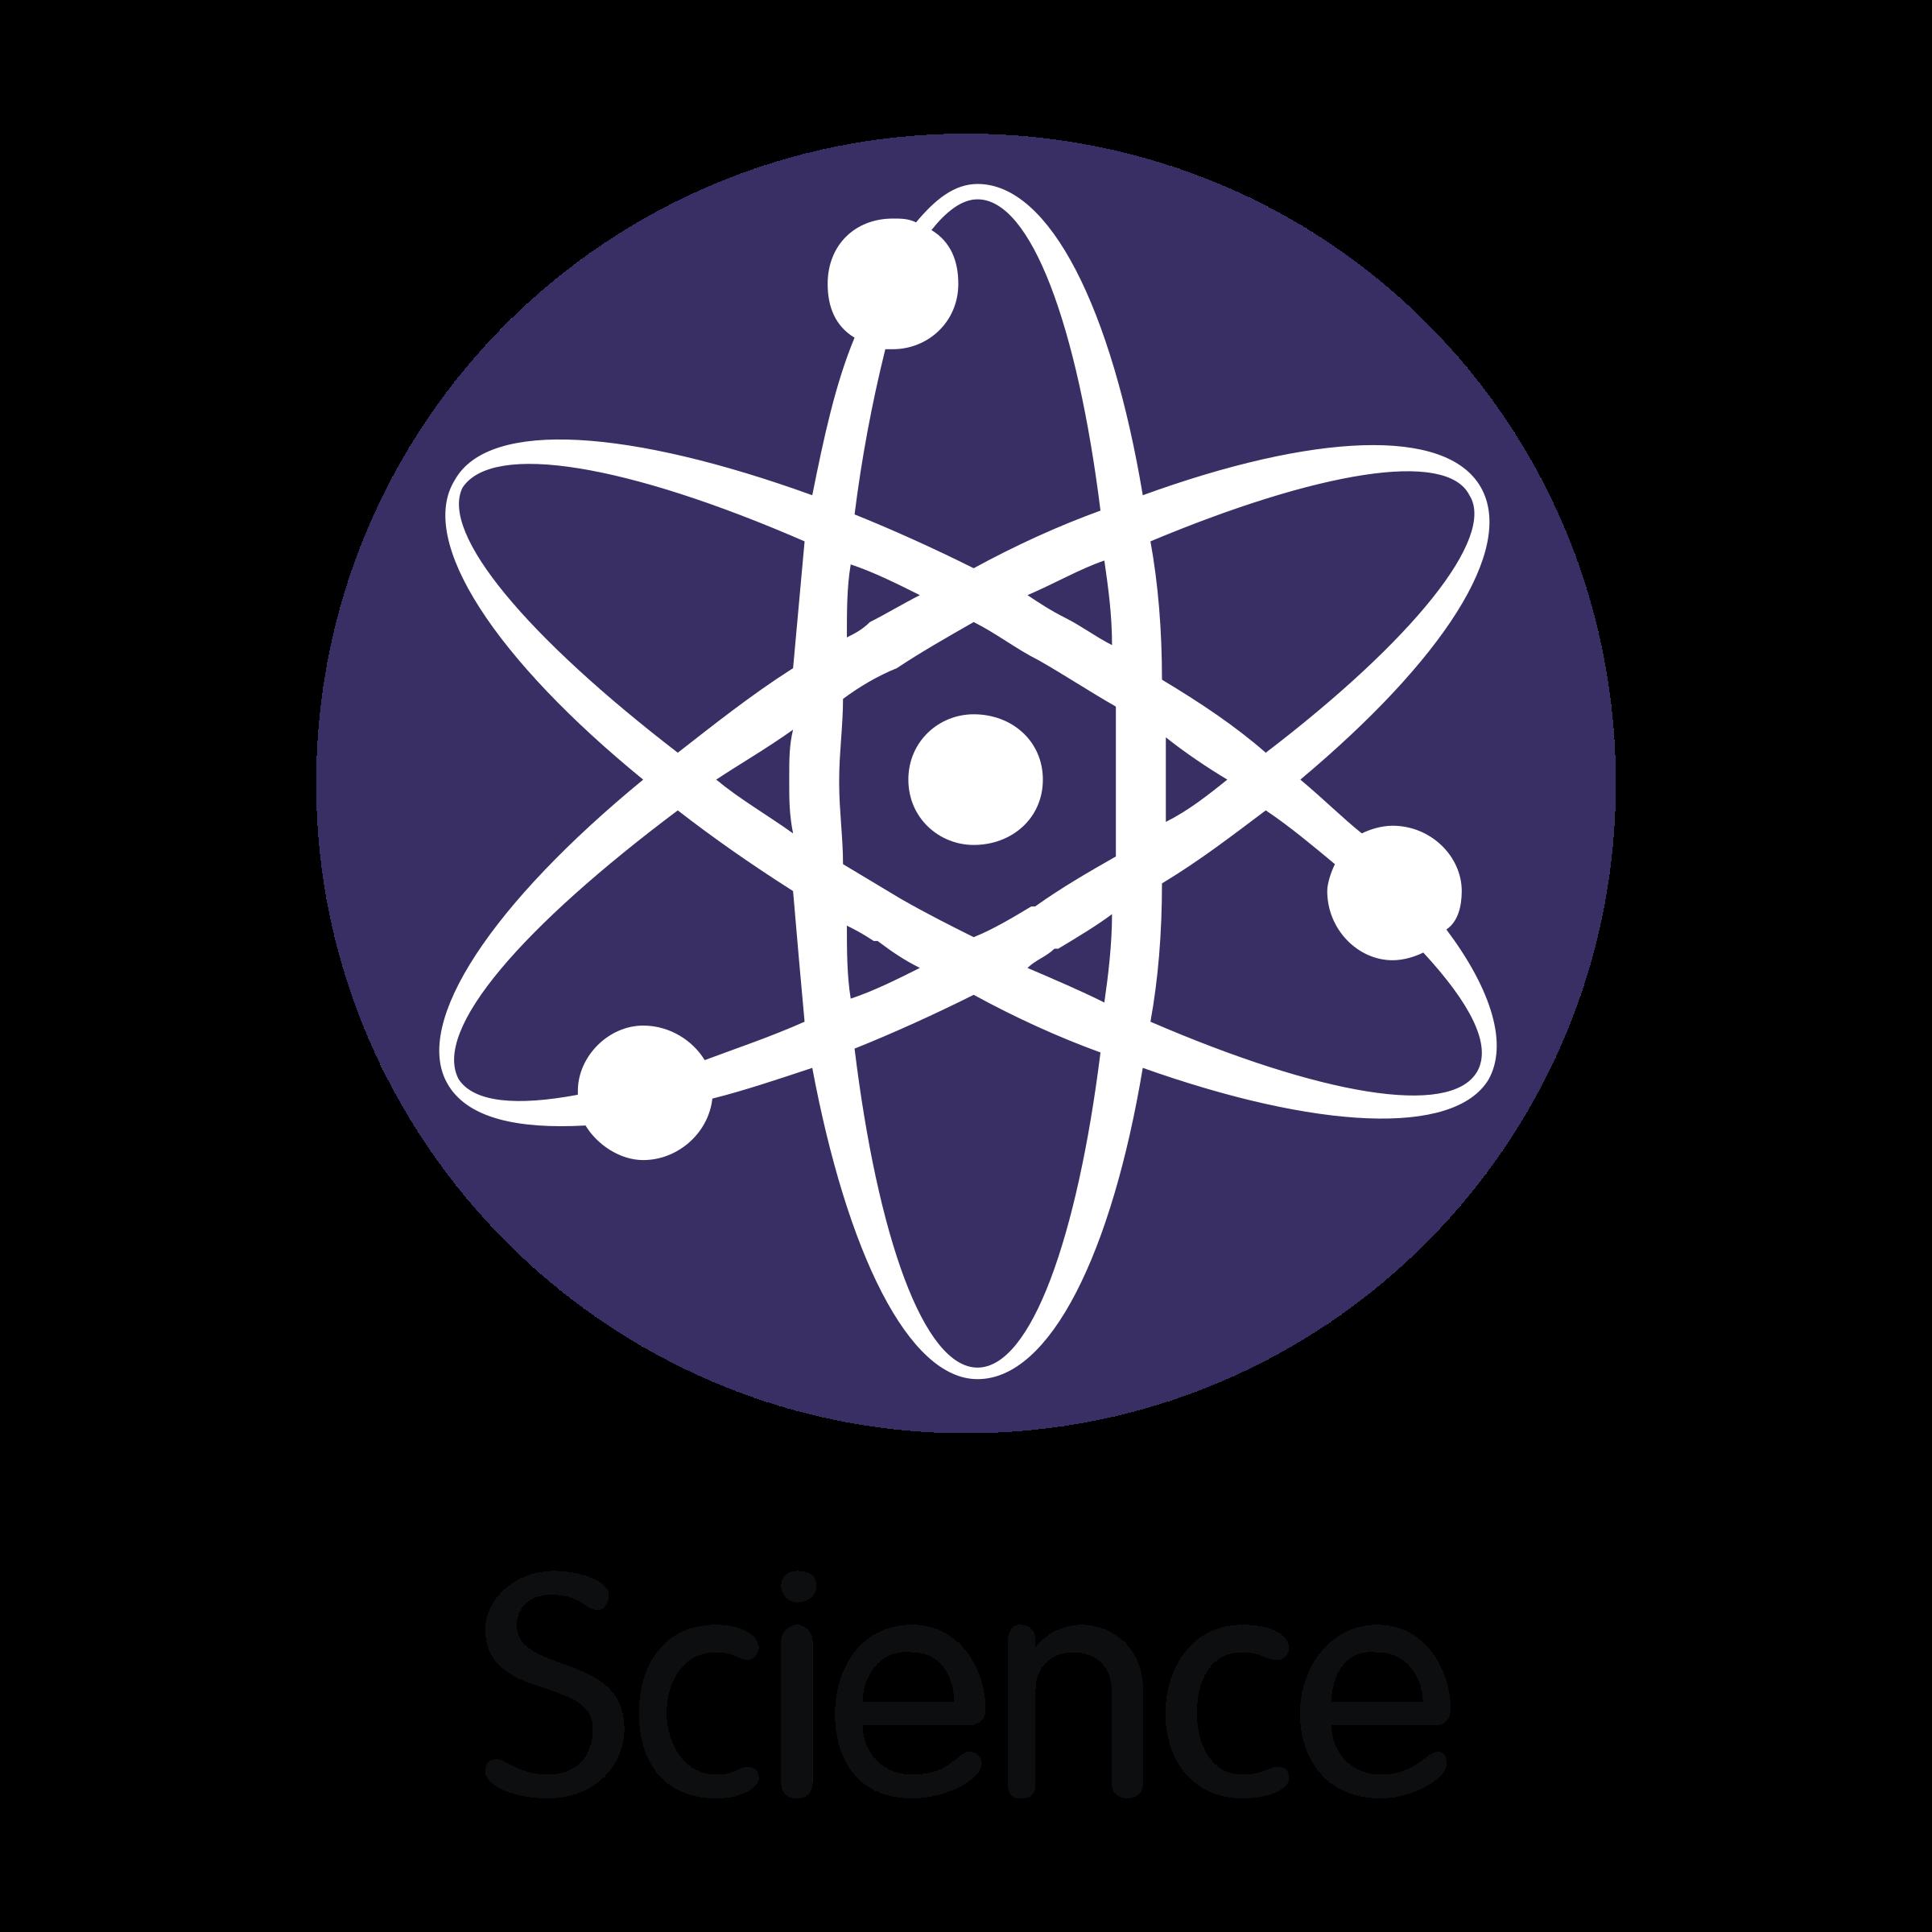 Science Colleges Logo PNG Transparent & SVG Vector.